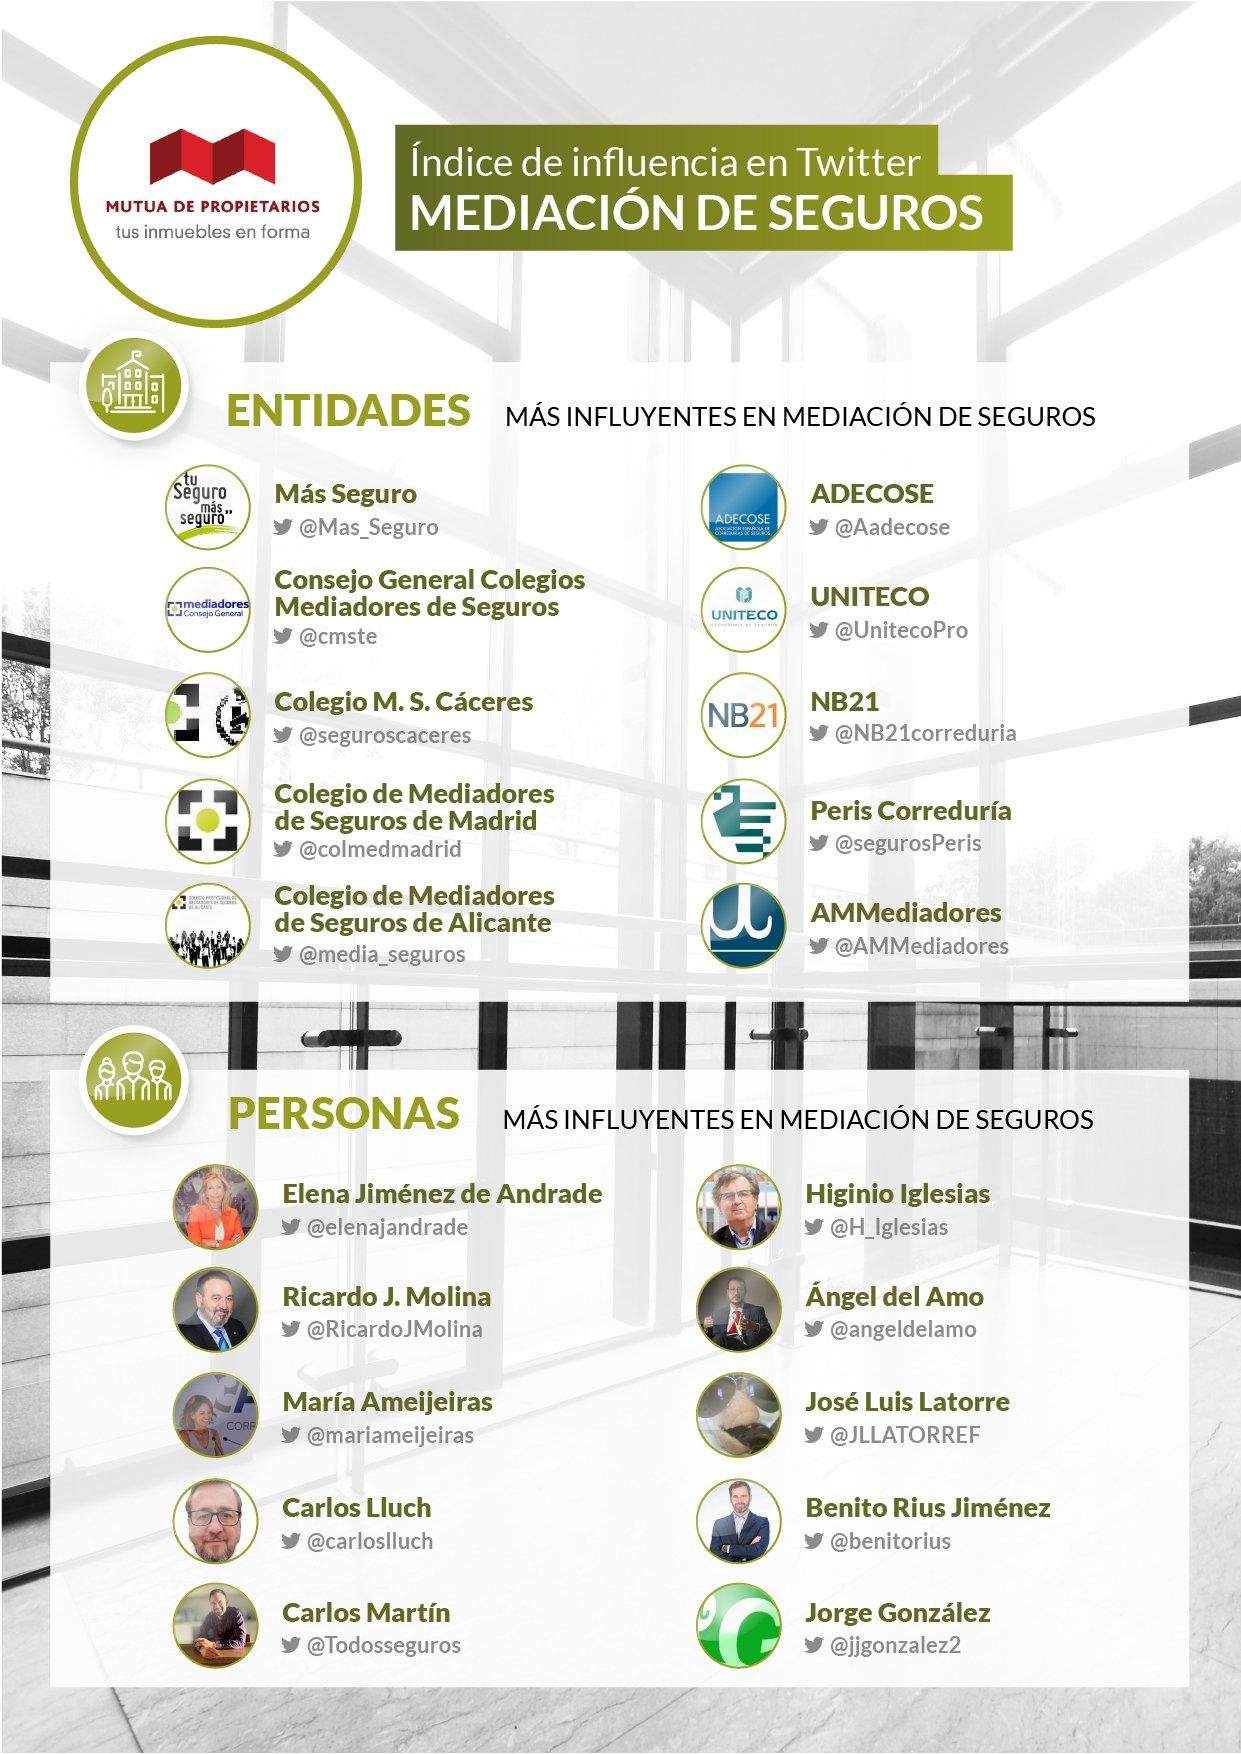 infografia ranking Mutua de Propietarios